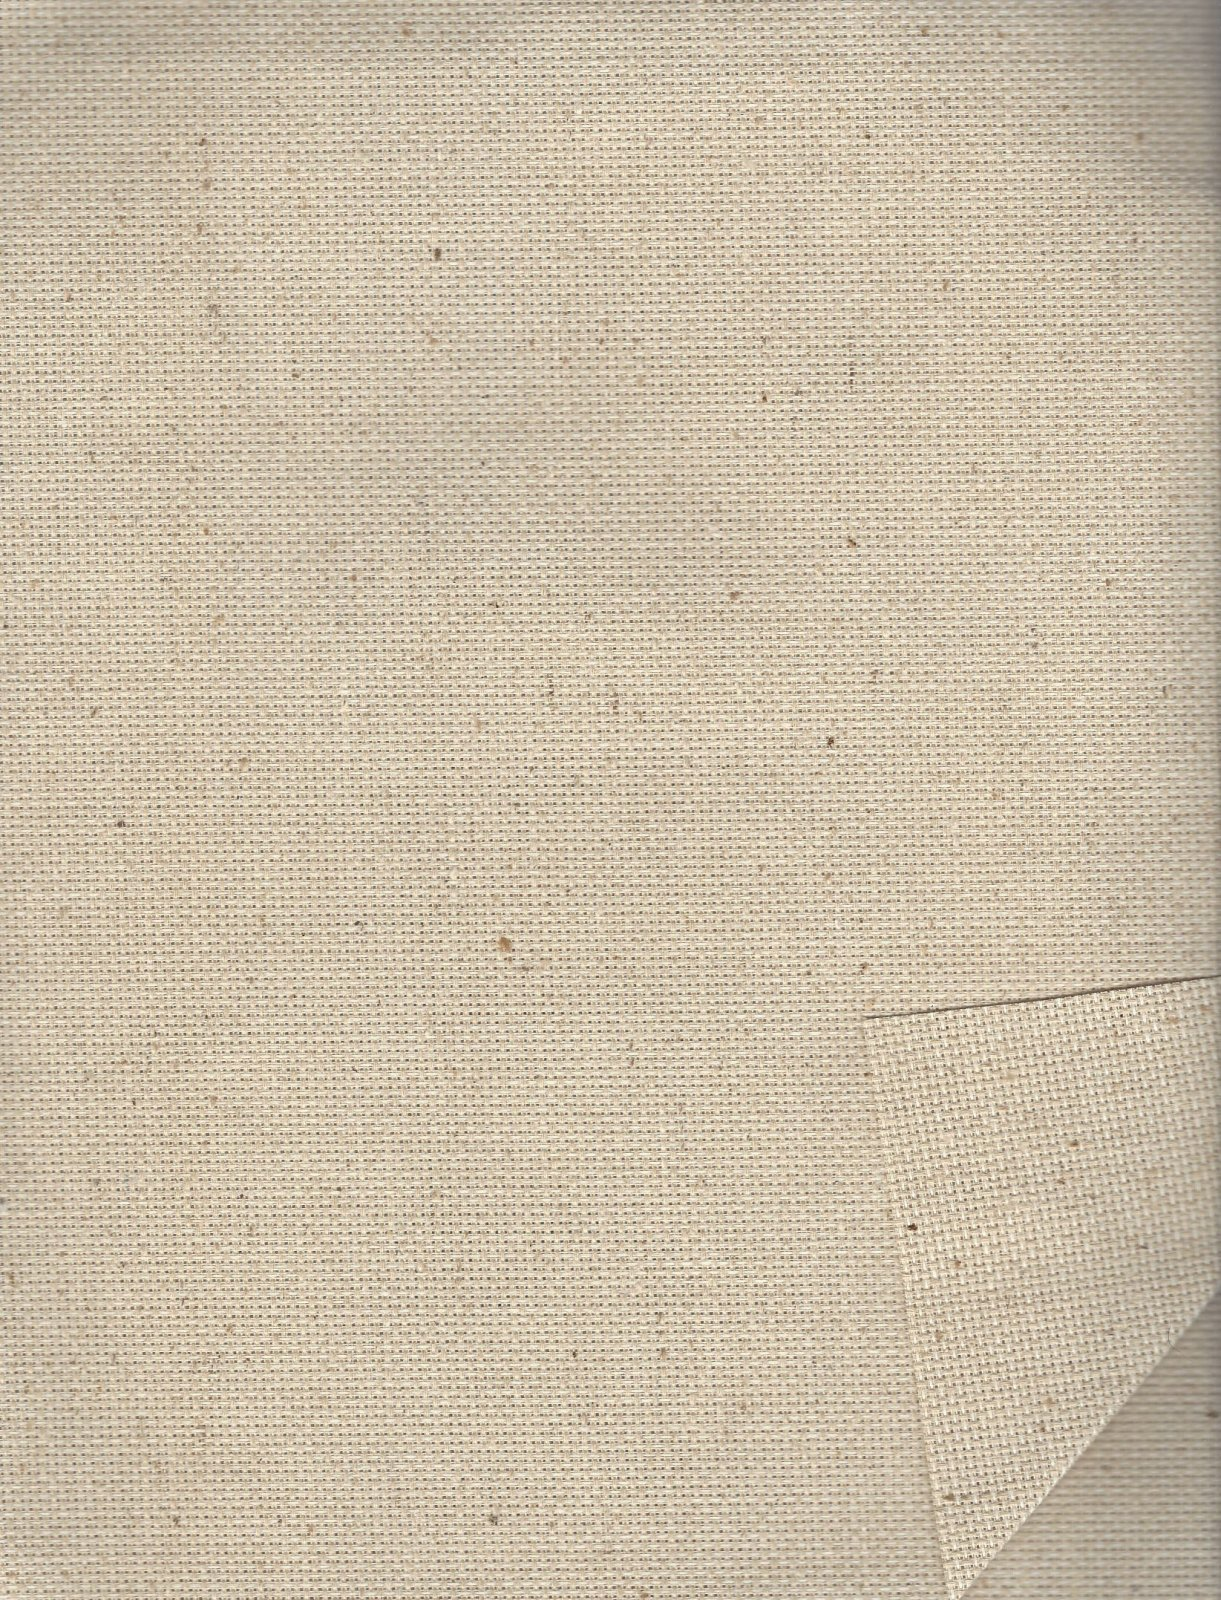 Aida 16ct Natural Rustico (variegated)